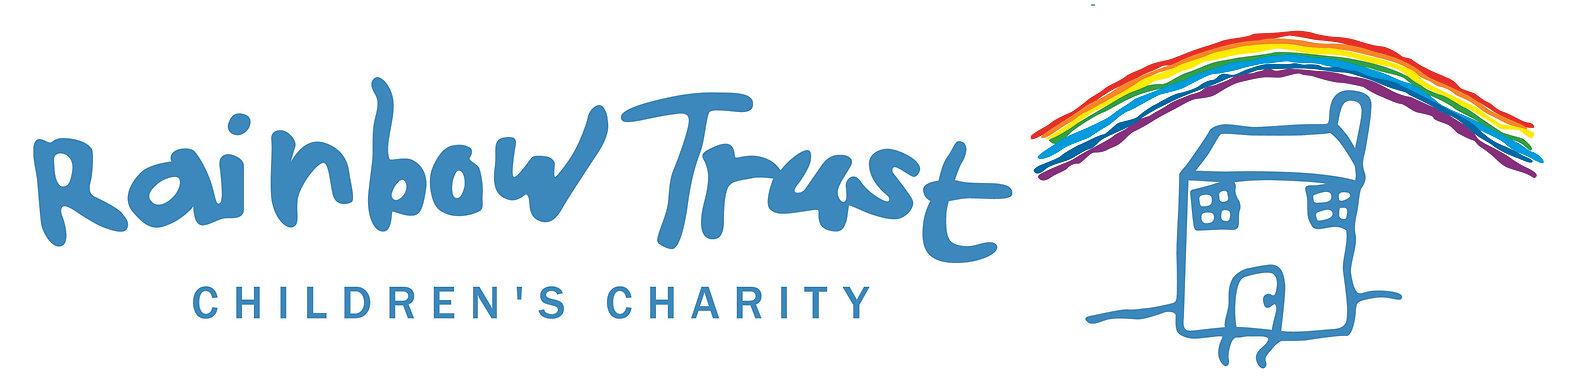 Rainbow-Trust-logo_vers1.jpg